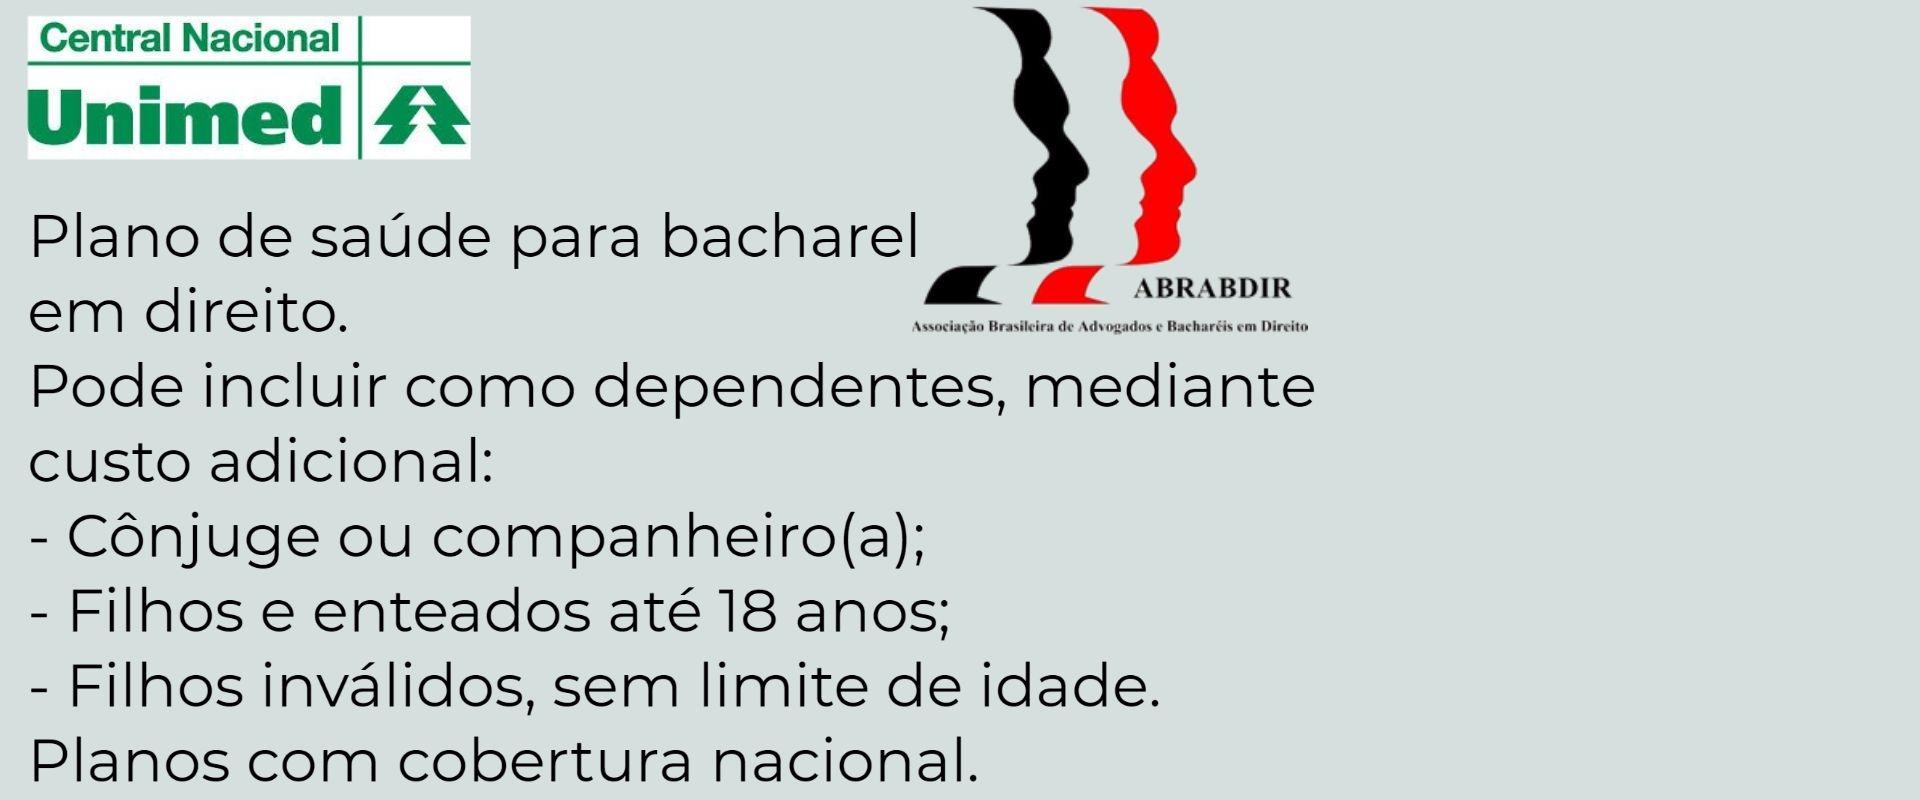 Unimed ABRABDIR Guaratinguetá